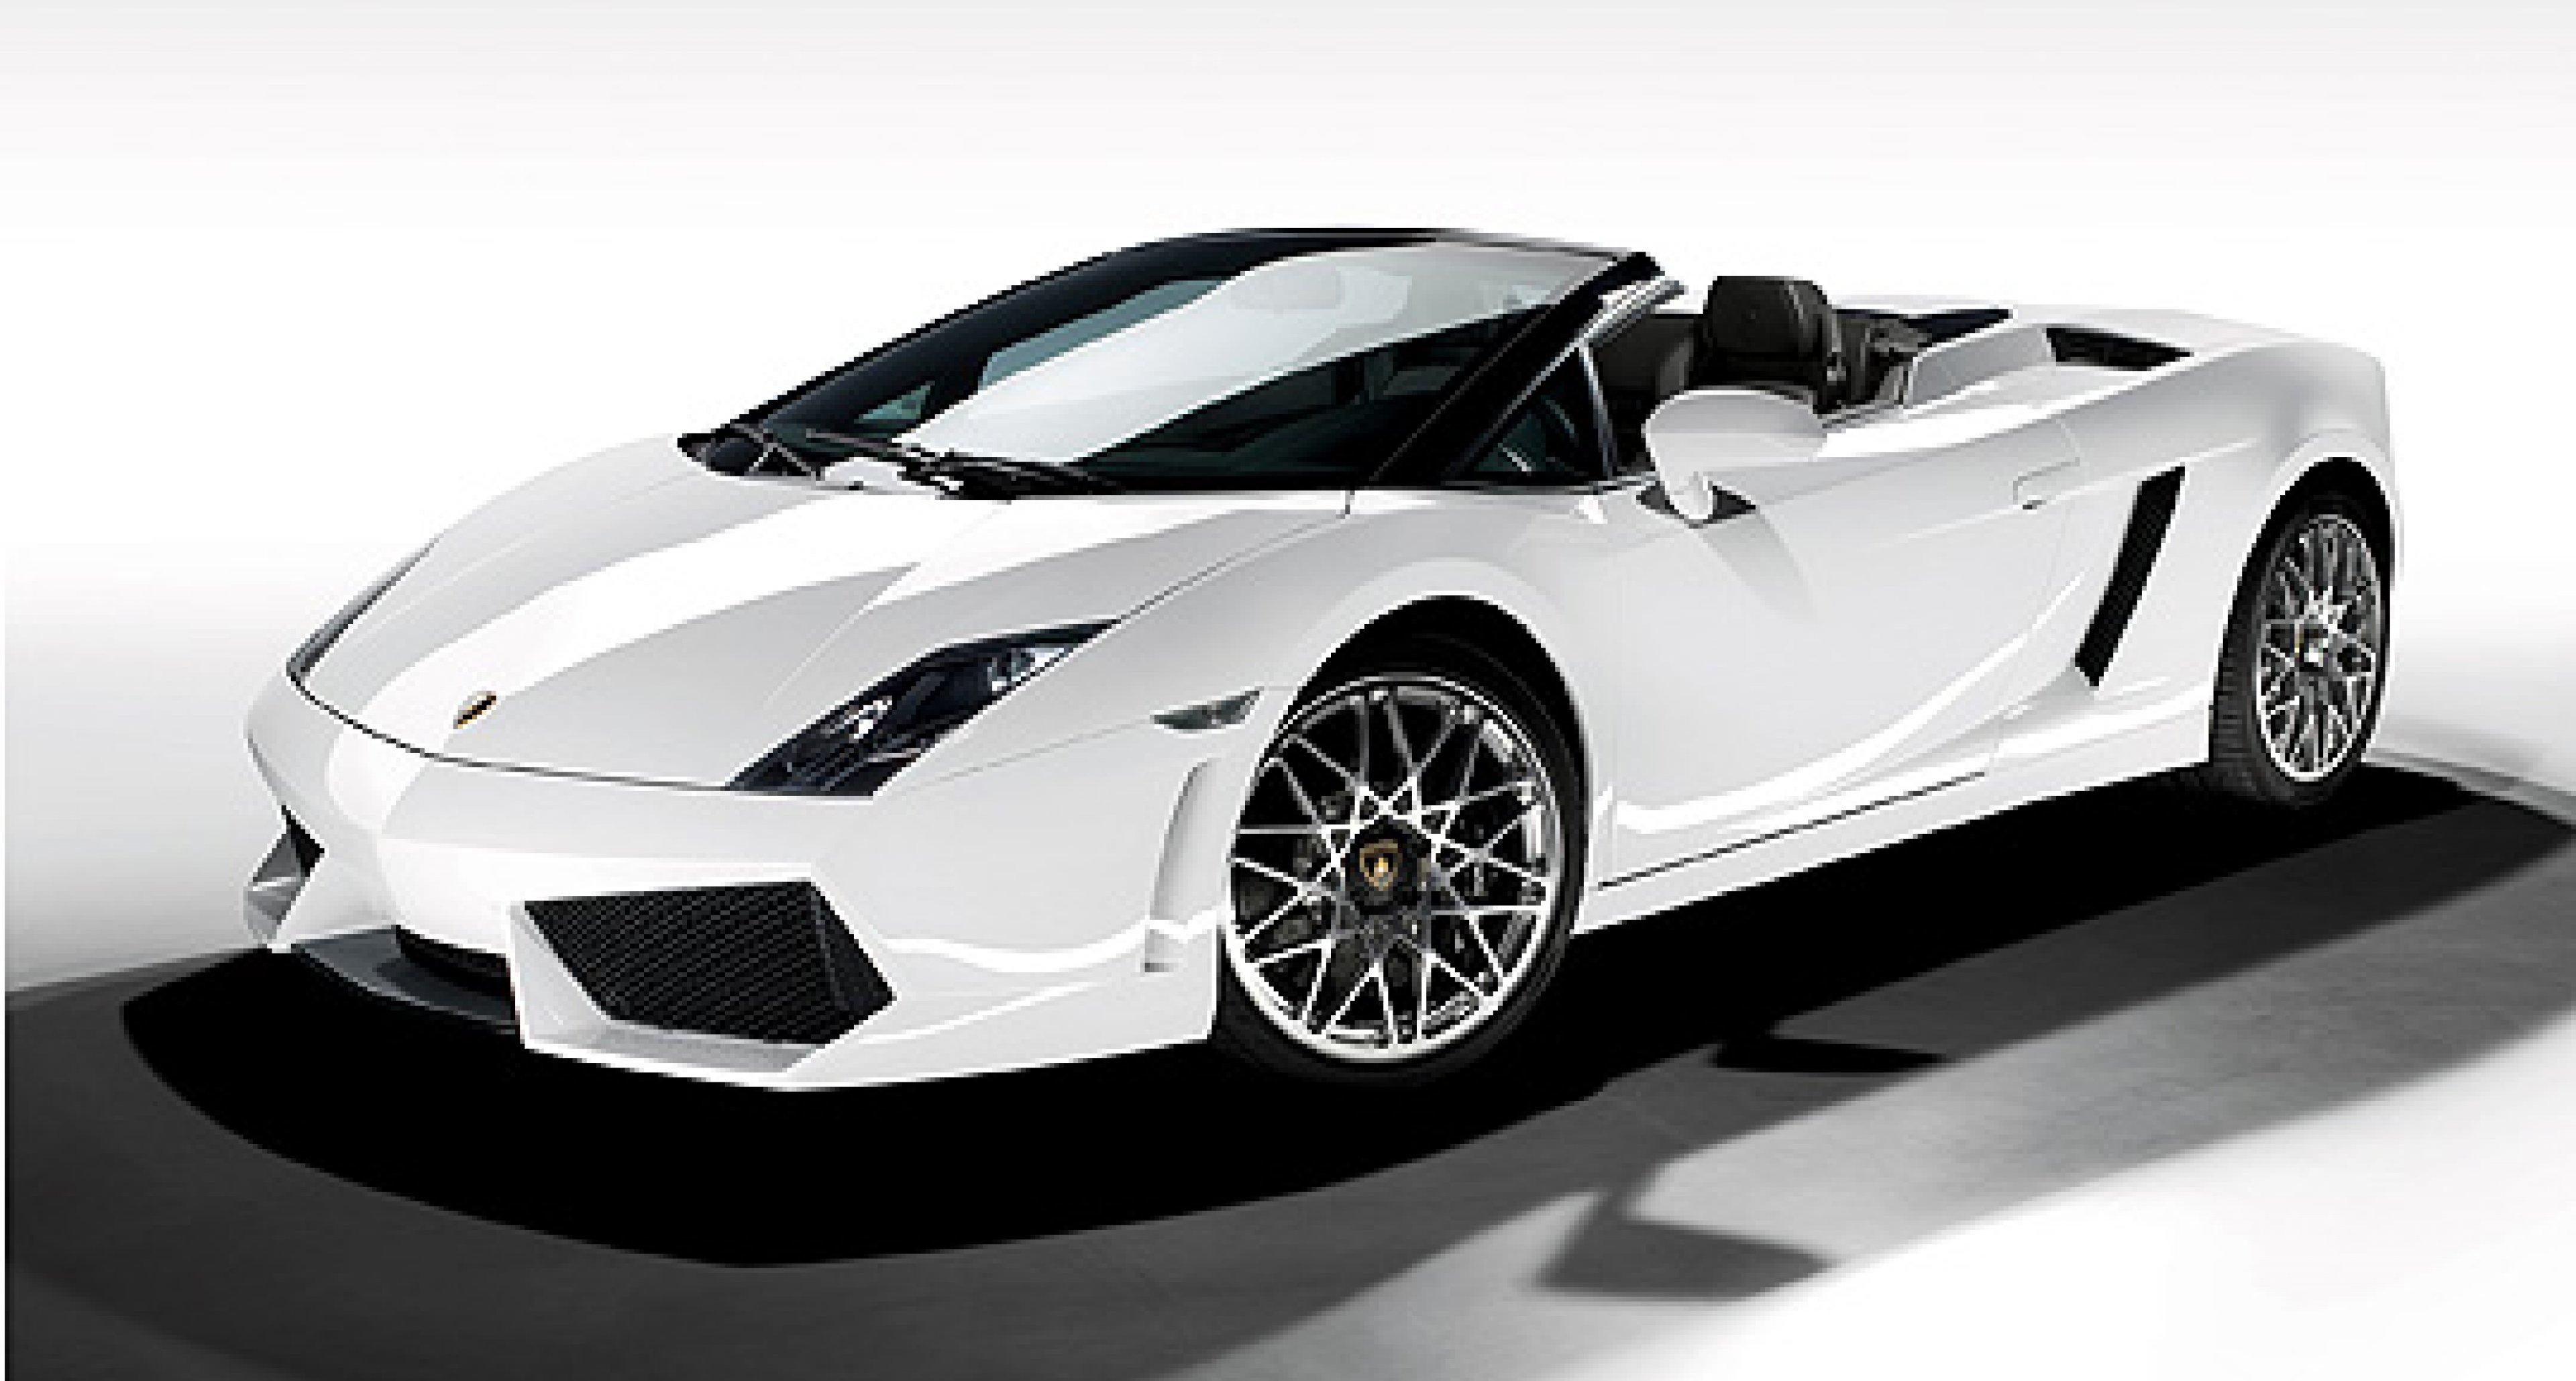 Lamborghini Gallardo LP560-4 Spyder: Grenzenlose Freiheit